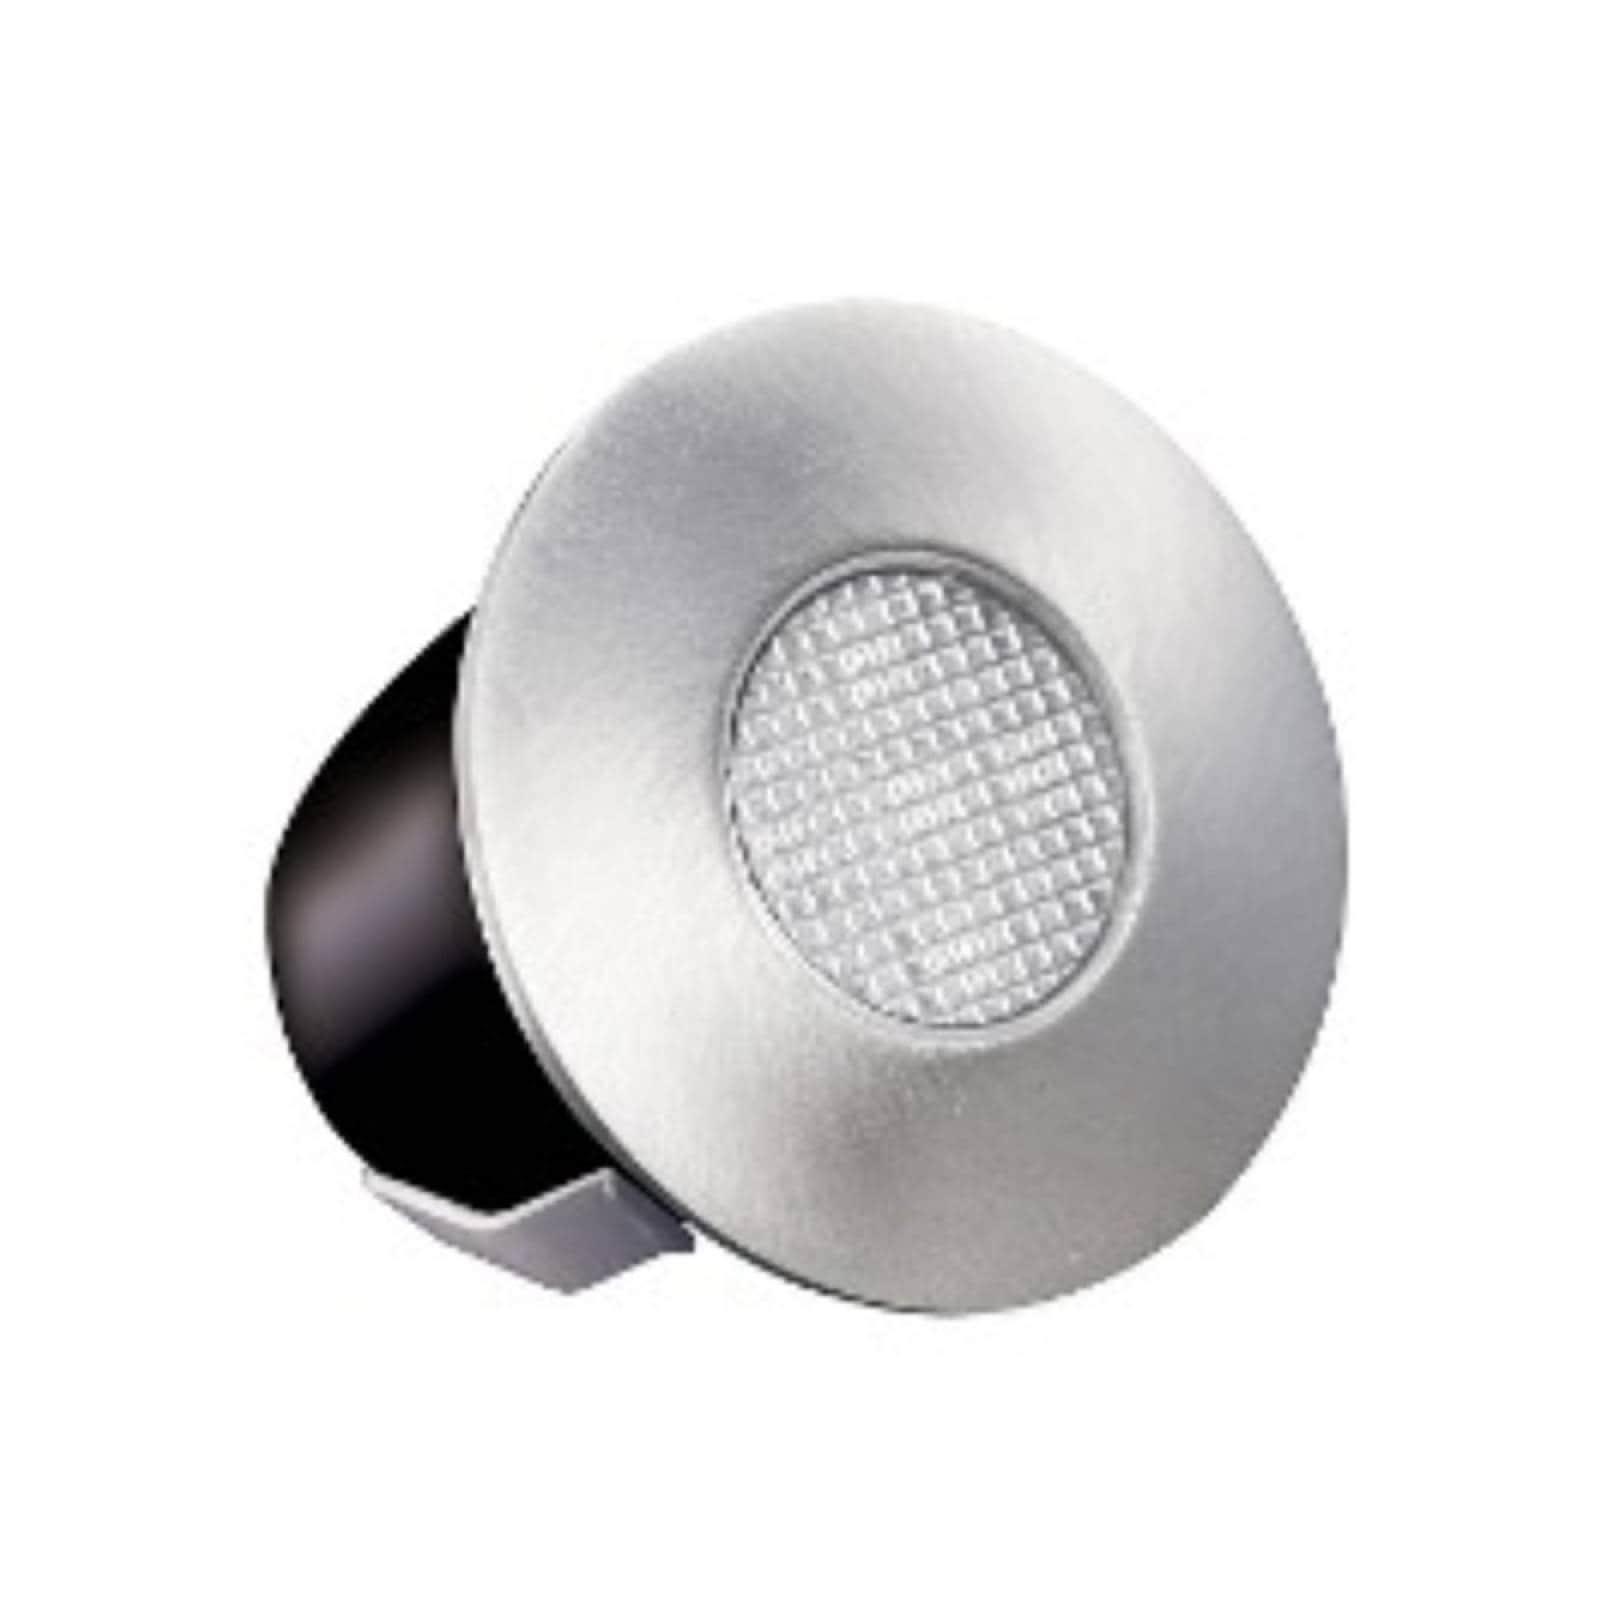 Lámpara Luminario Led Piso Ad-5716 1W Azul 60mm Adir